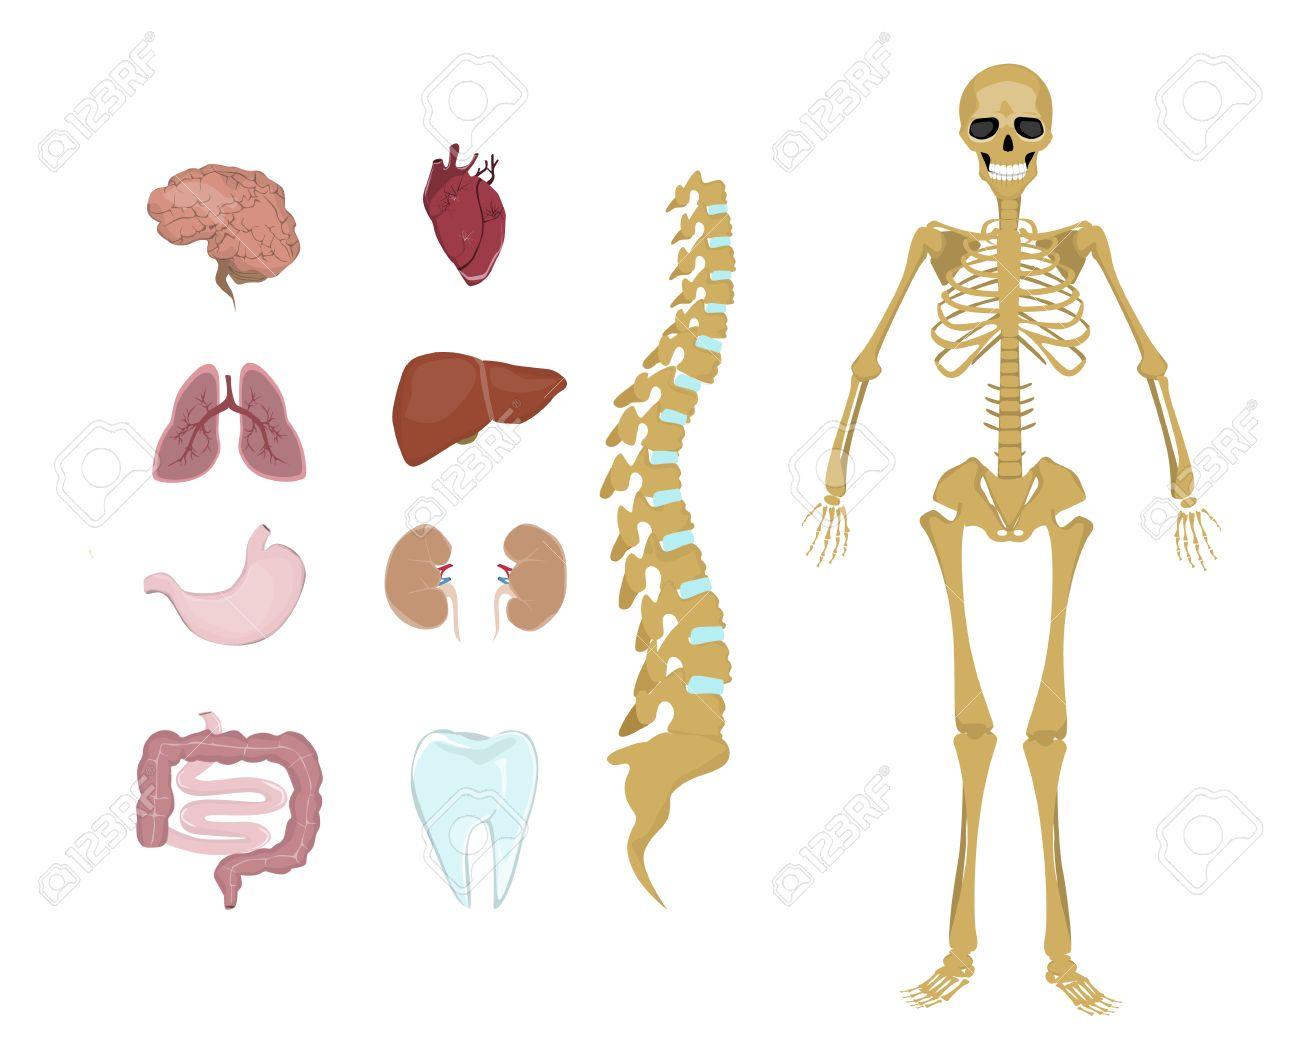 Anatomie Humaine Entier Tous Les Systemes Du Corps Humain Comme